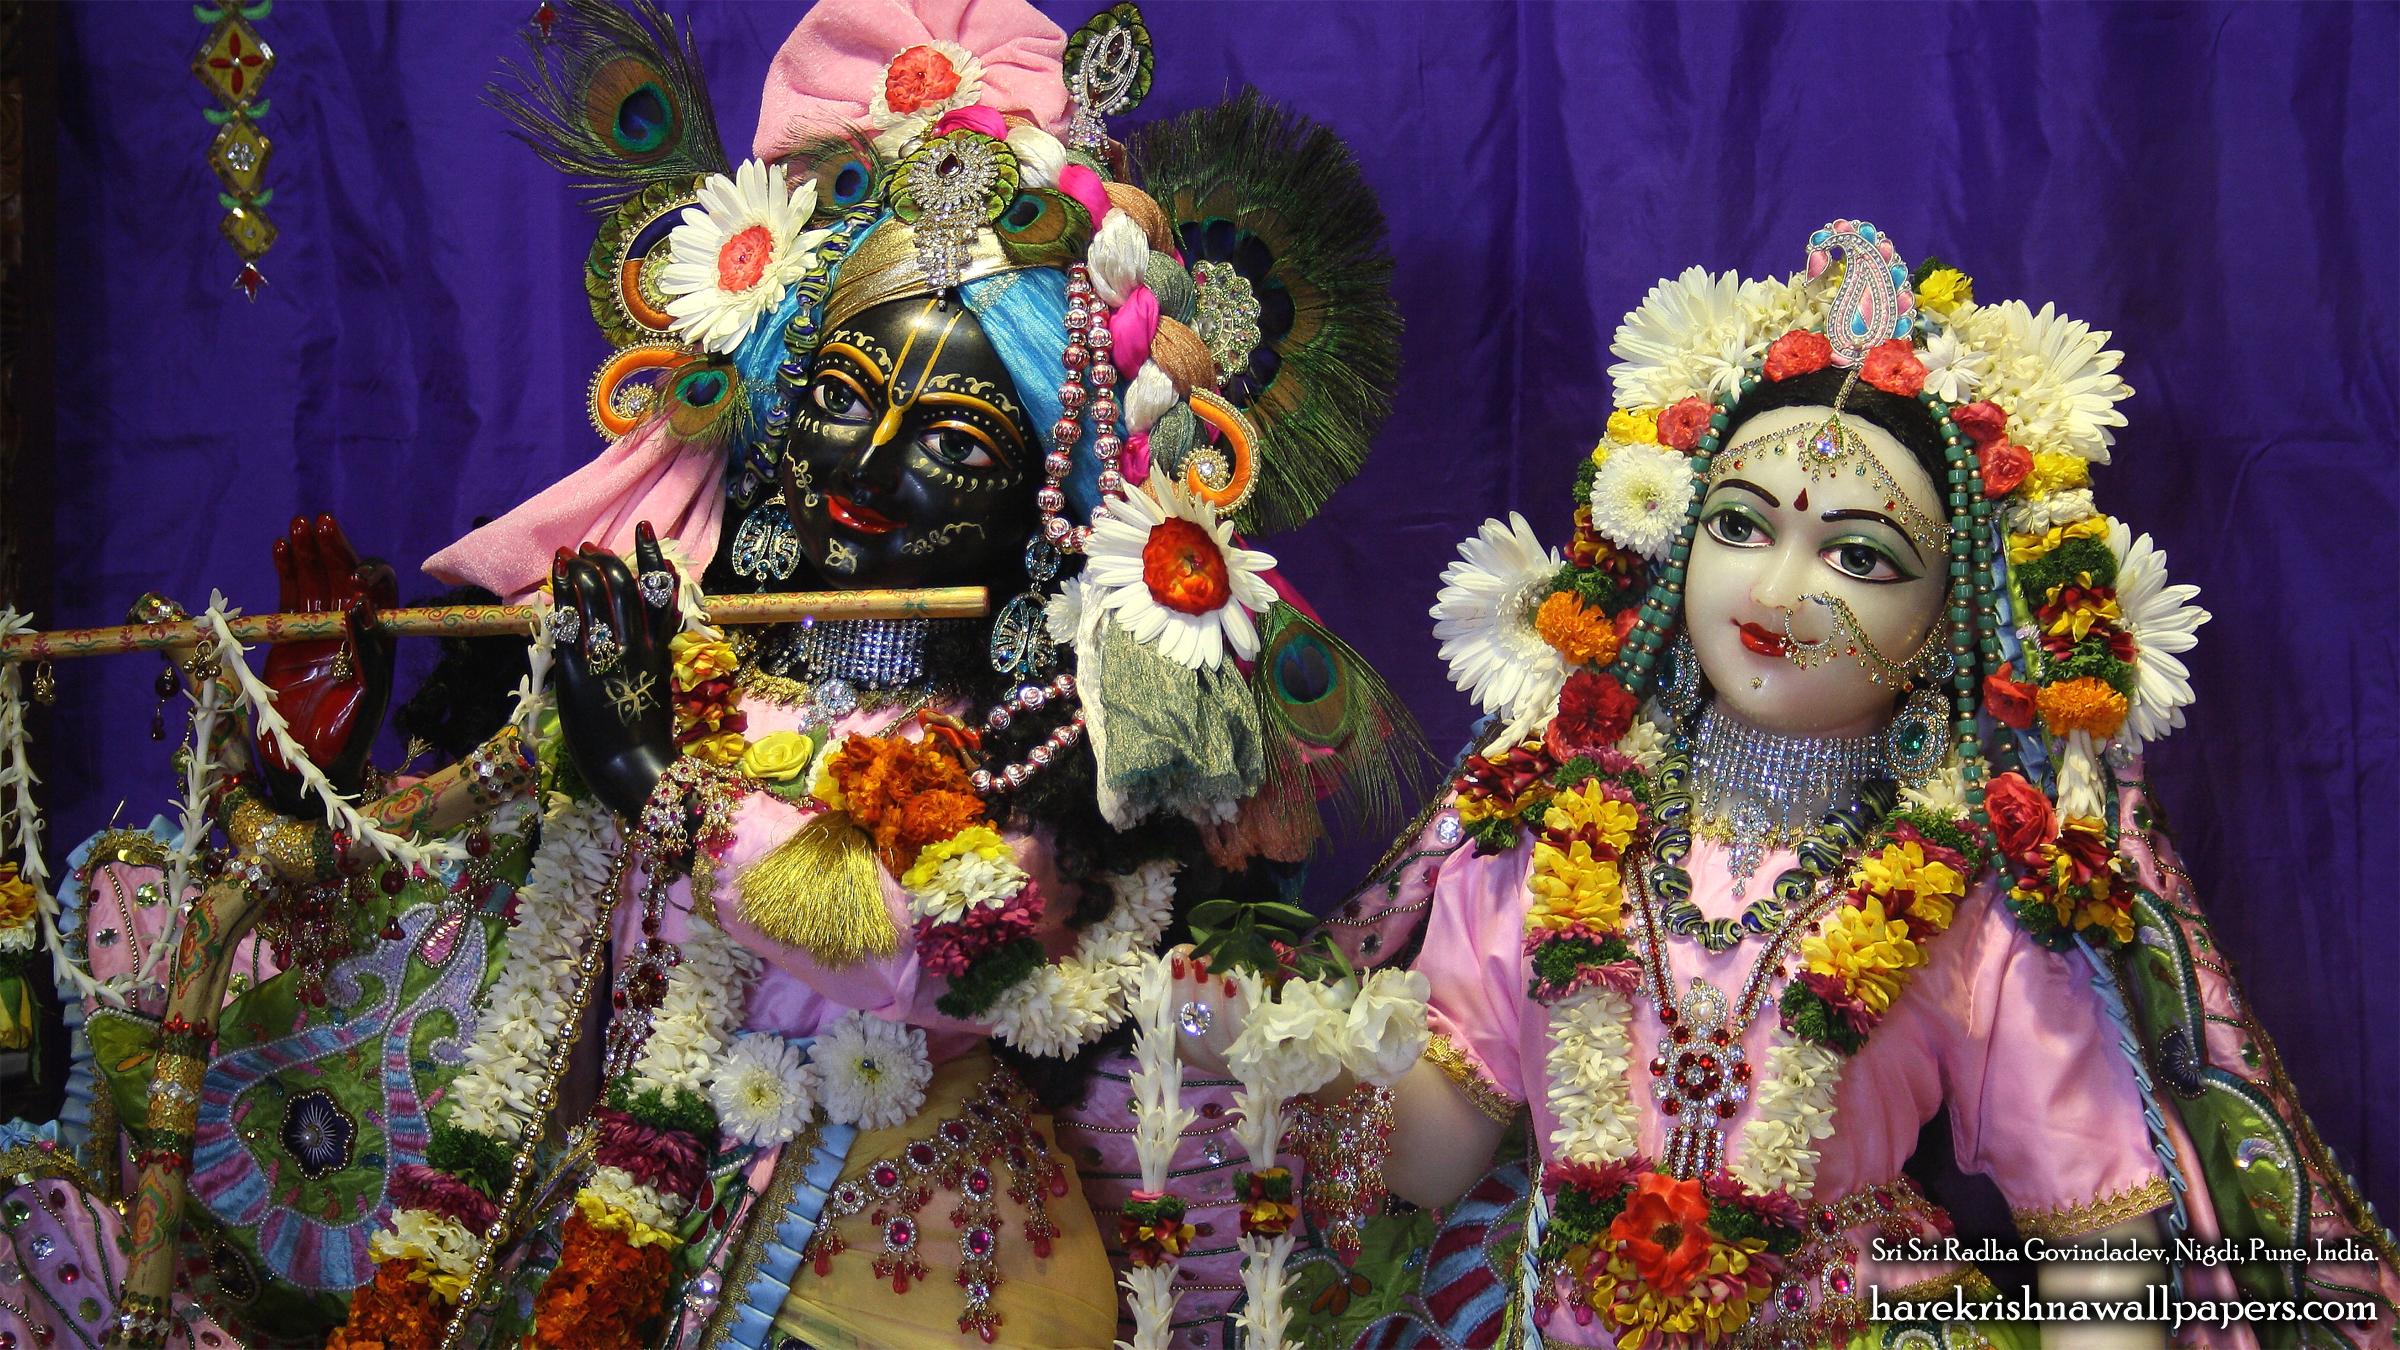 Sri Sri Radha Govind Close up Wallpaper (013) Size 2400x1350 Download